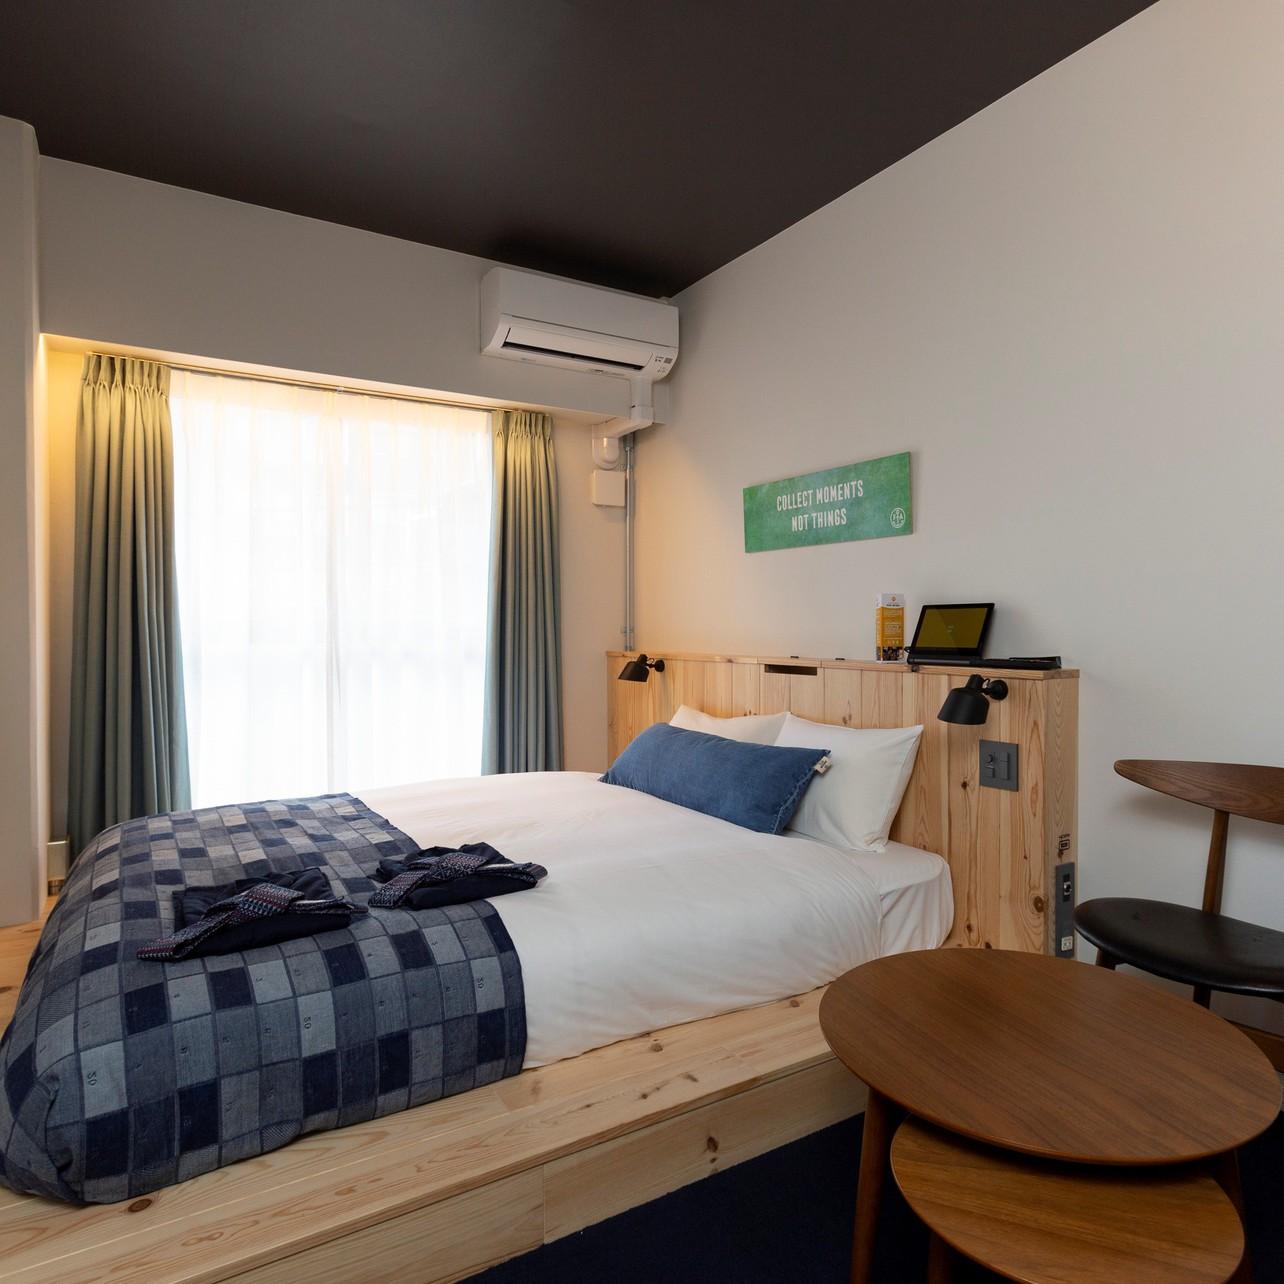 ANCHOR HOTEL(アンカーホテル福山) /  広々シングルルーム18平米★ベッドはクイーンサイズ